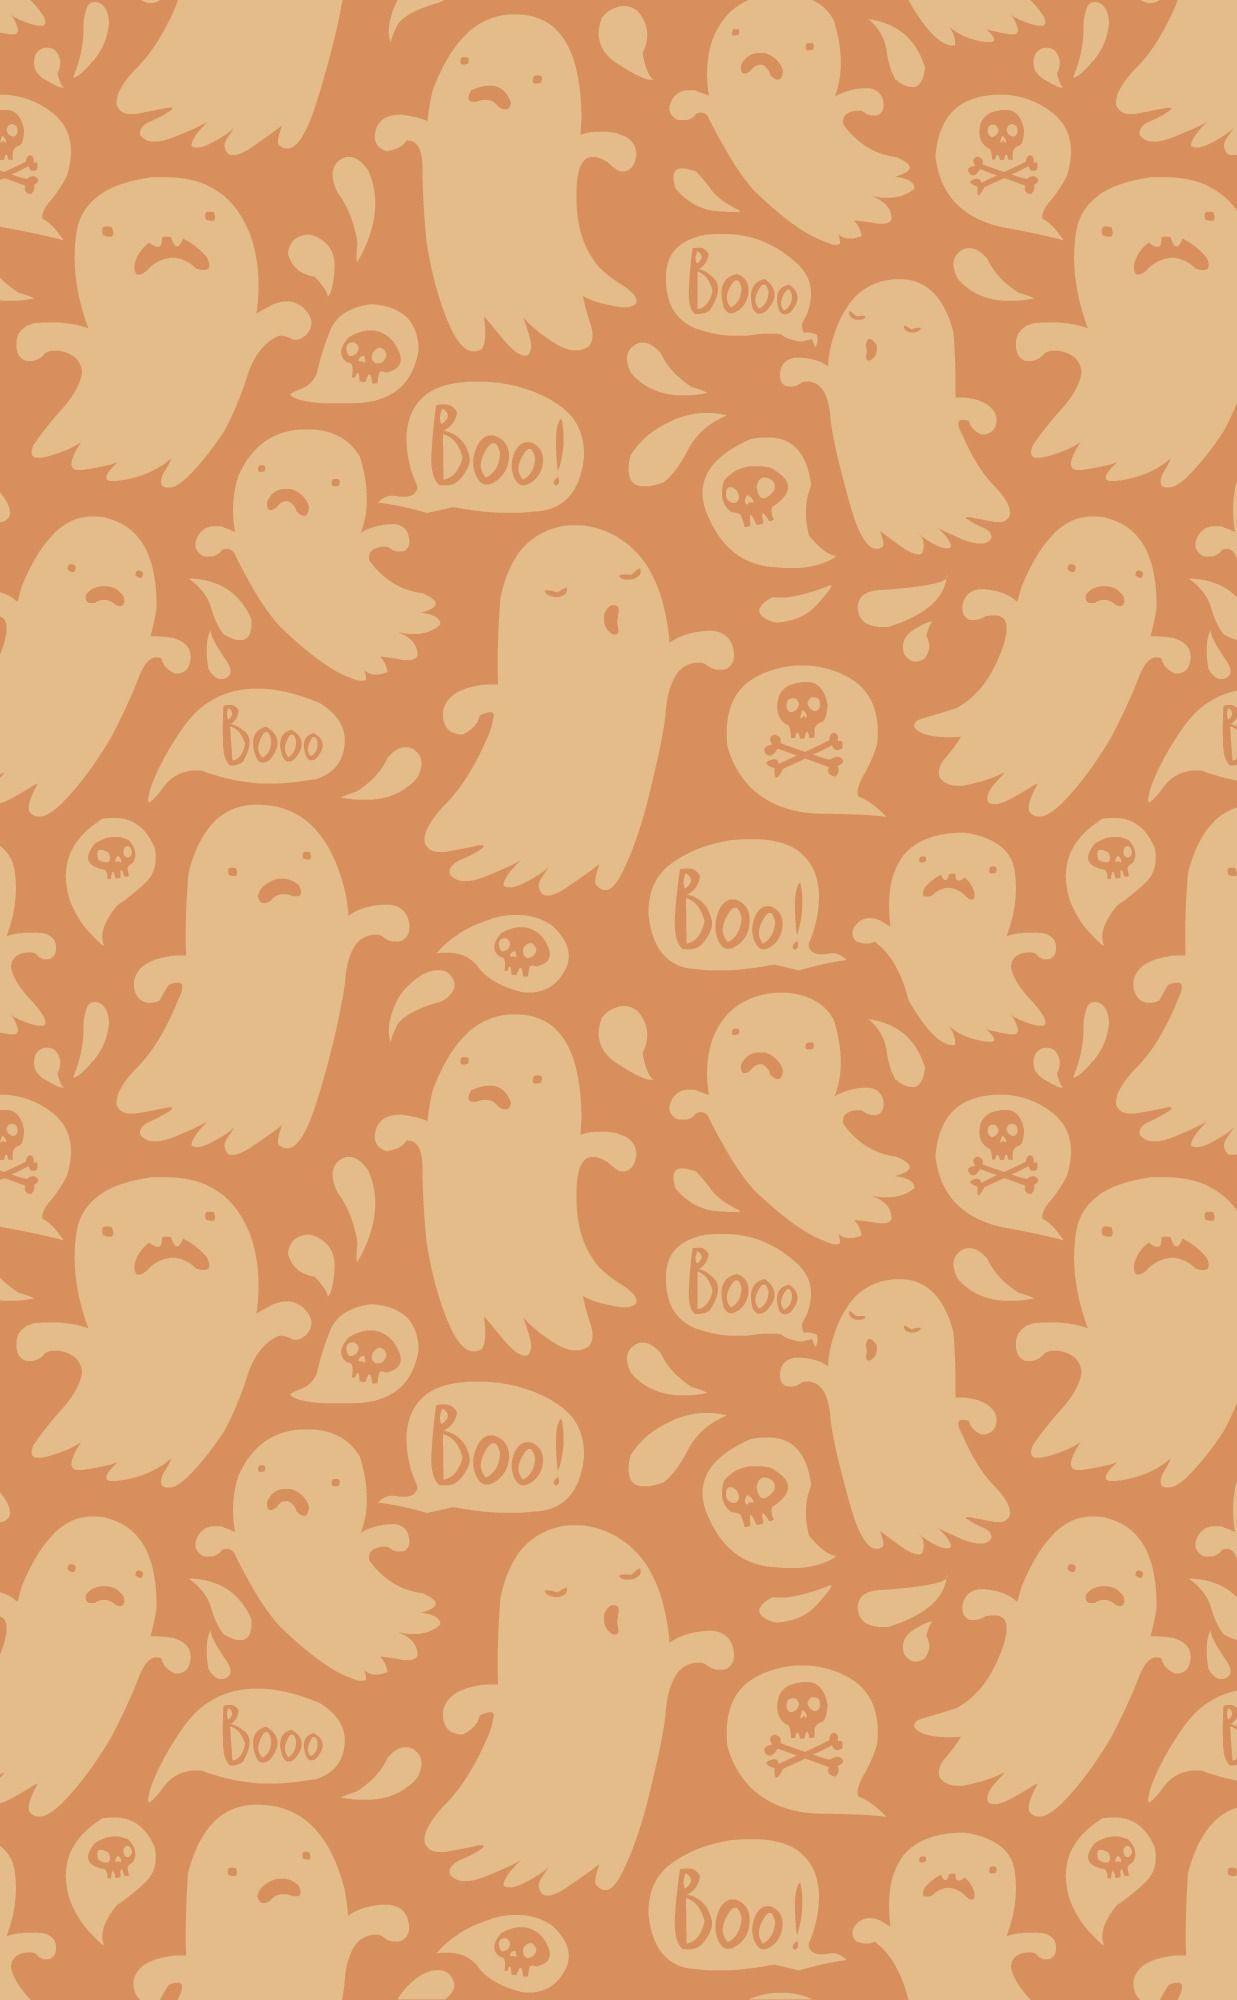 Tumblr Halloween Wallpapers Wallpaper Cave